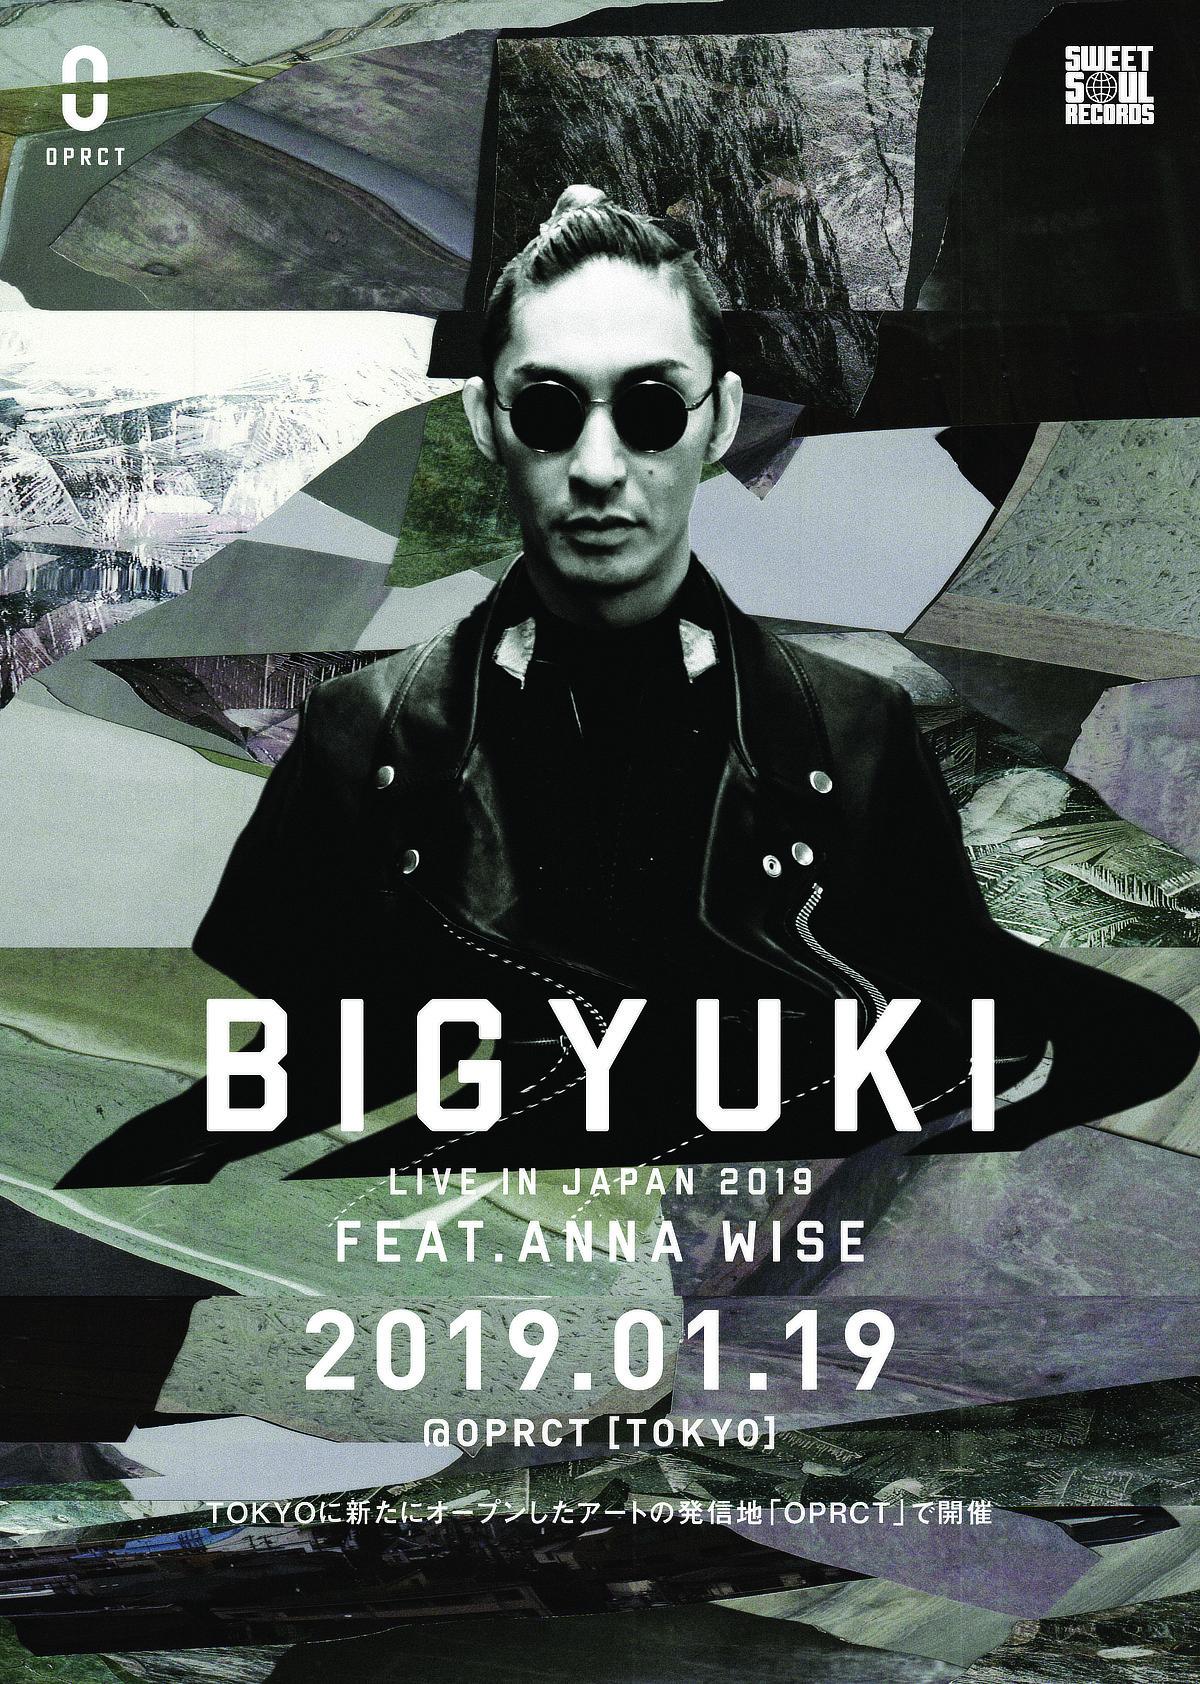 BIG YUKI FLYER.jpg